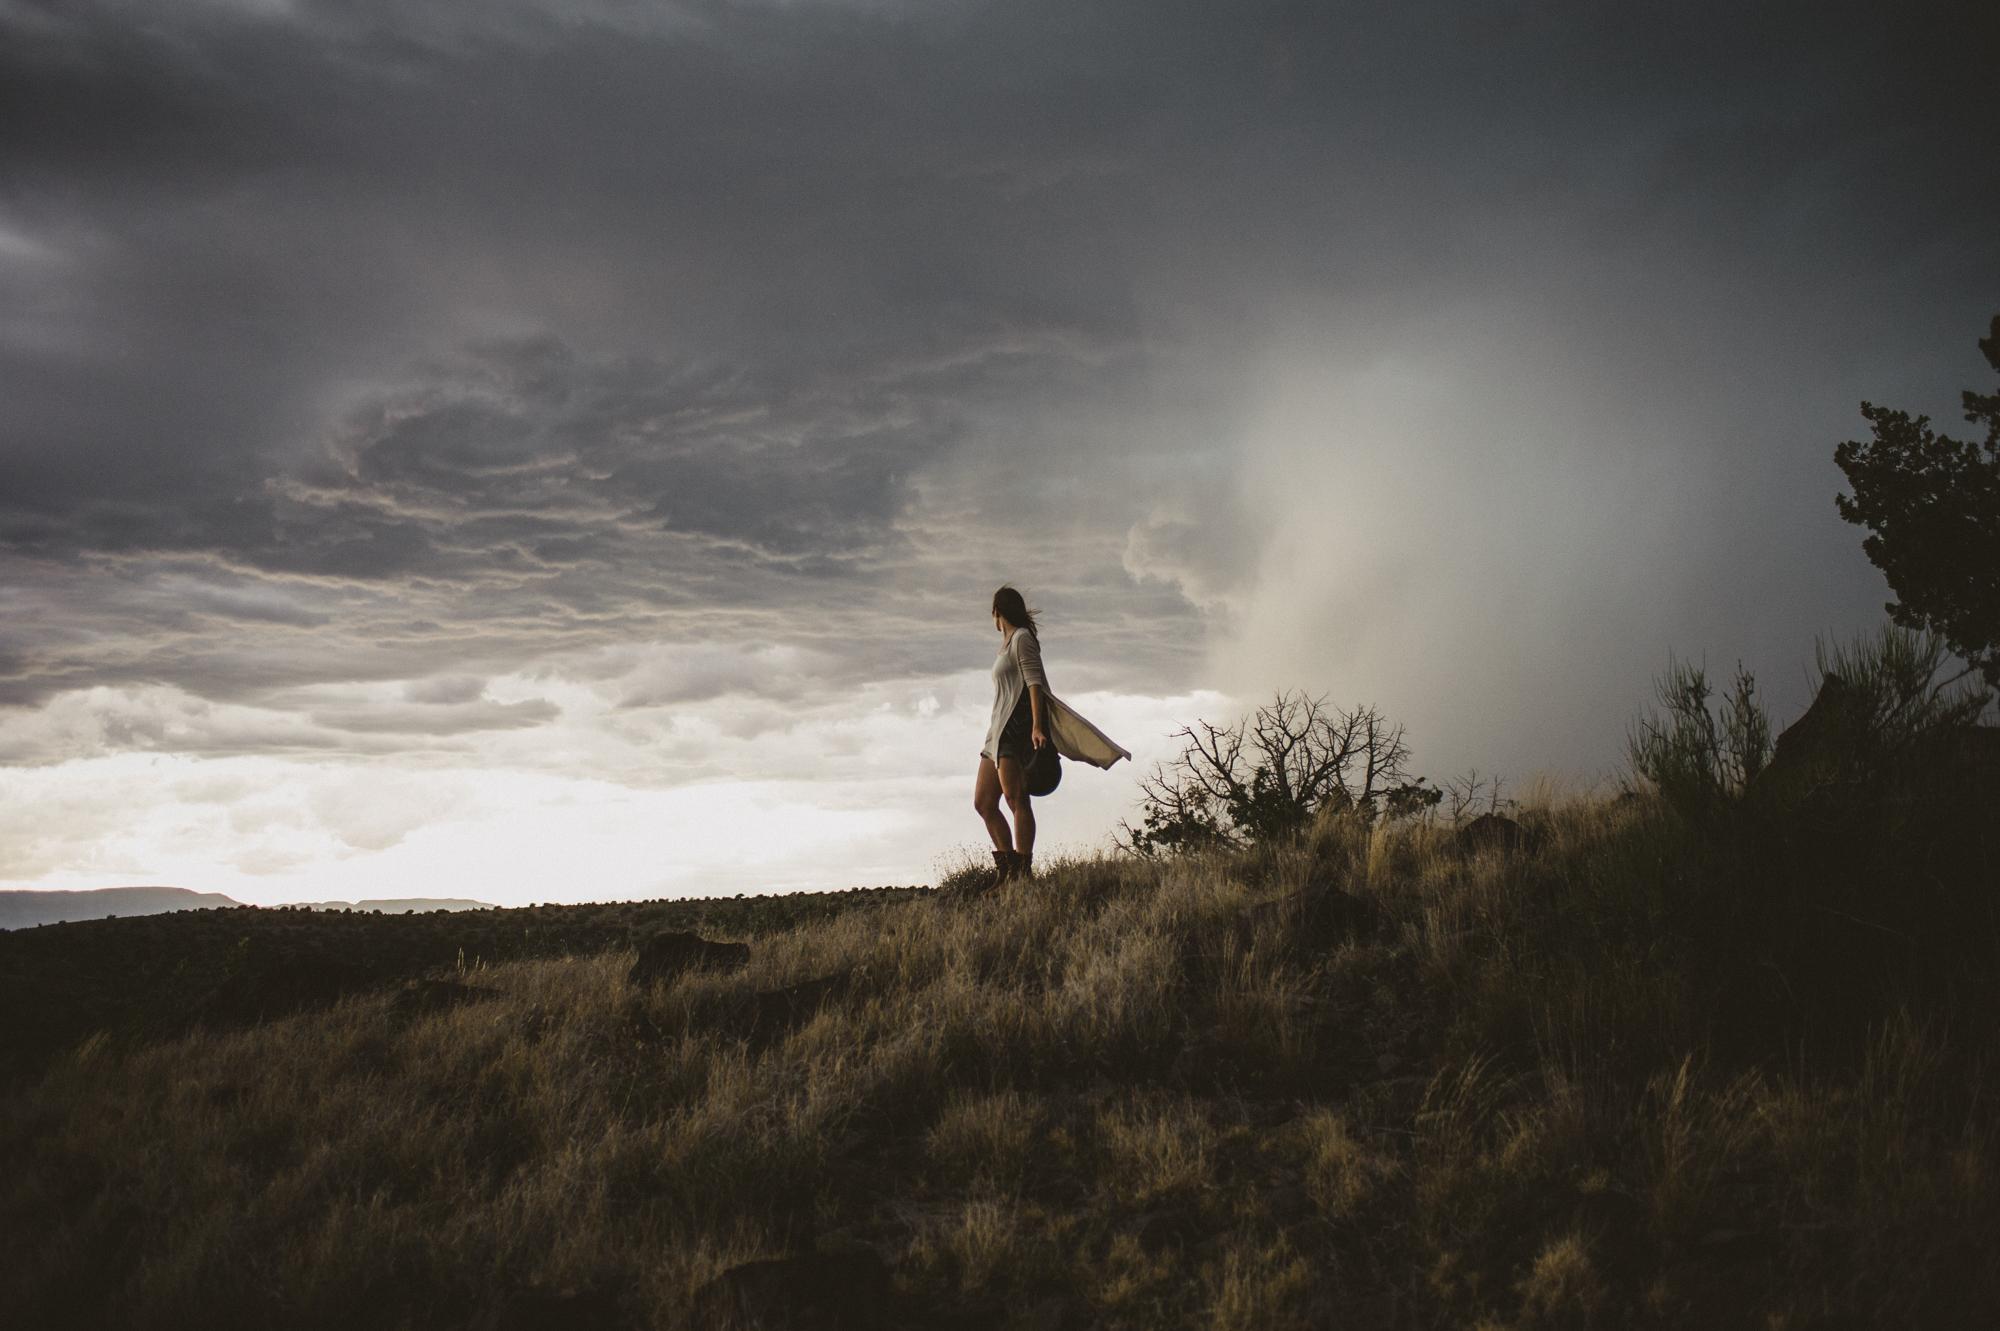 KC_Lifestyle_Photographer_Visiting_Arizona_Sedona_3768.jpg